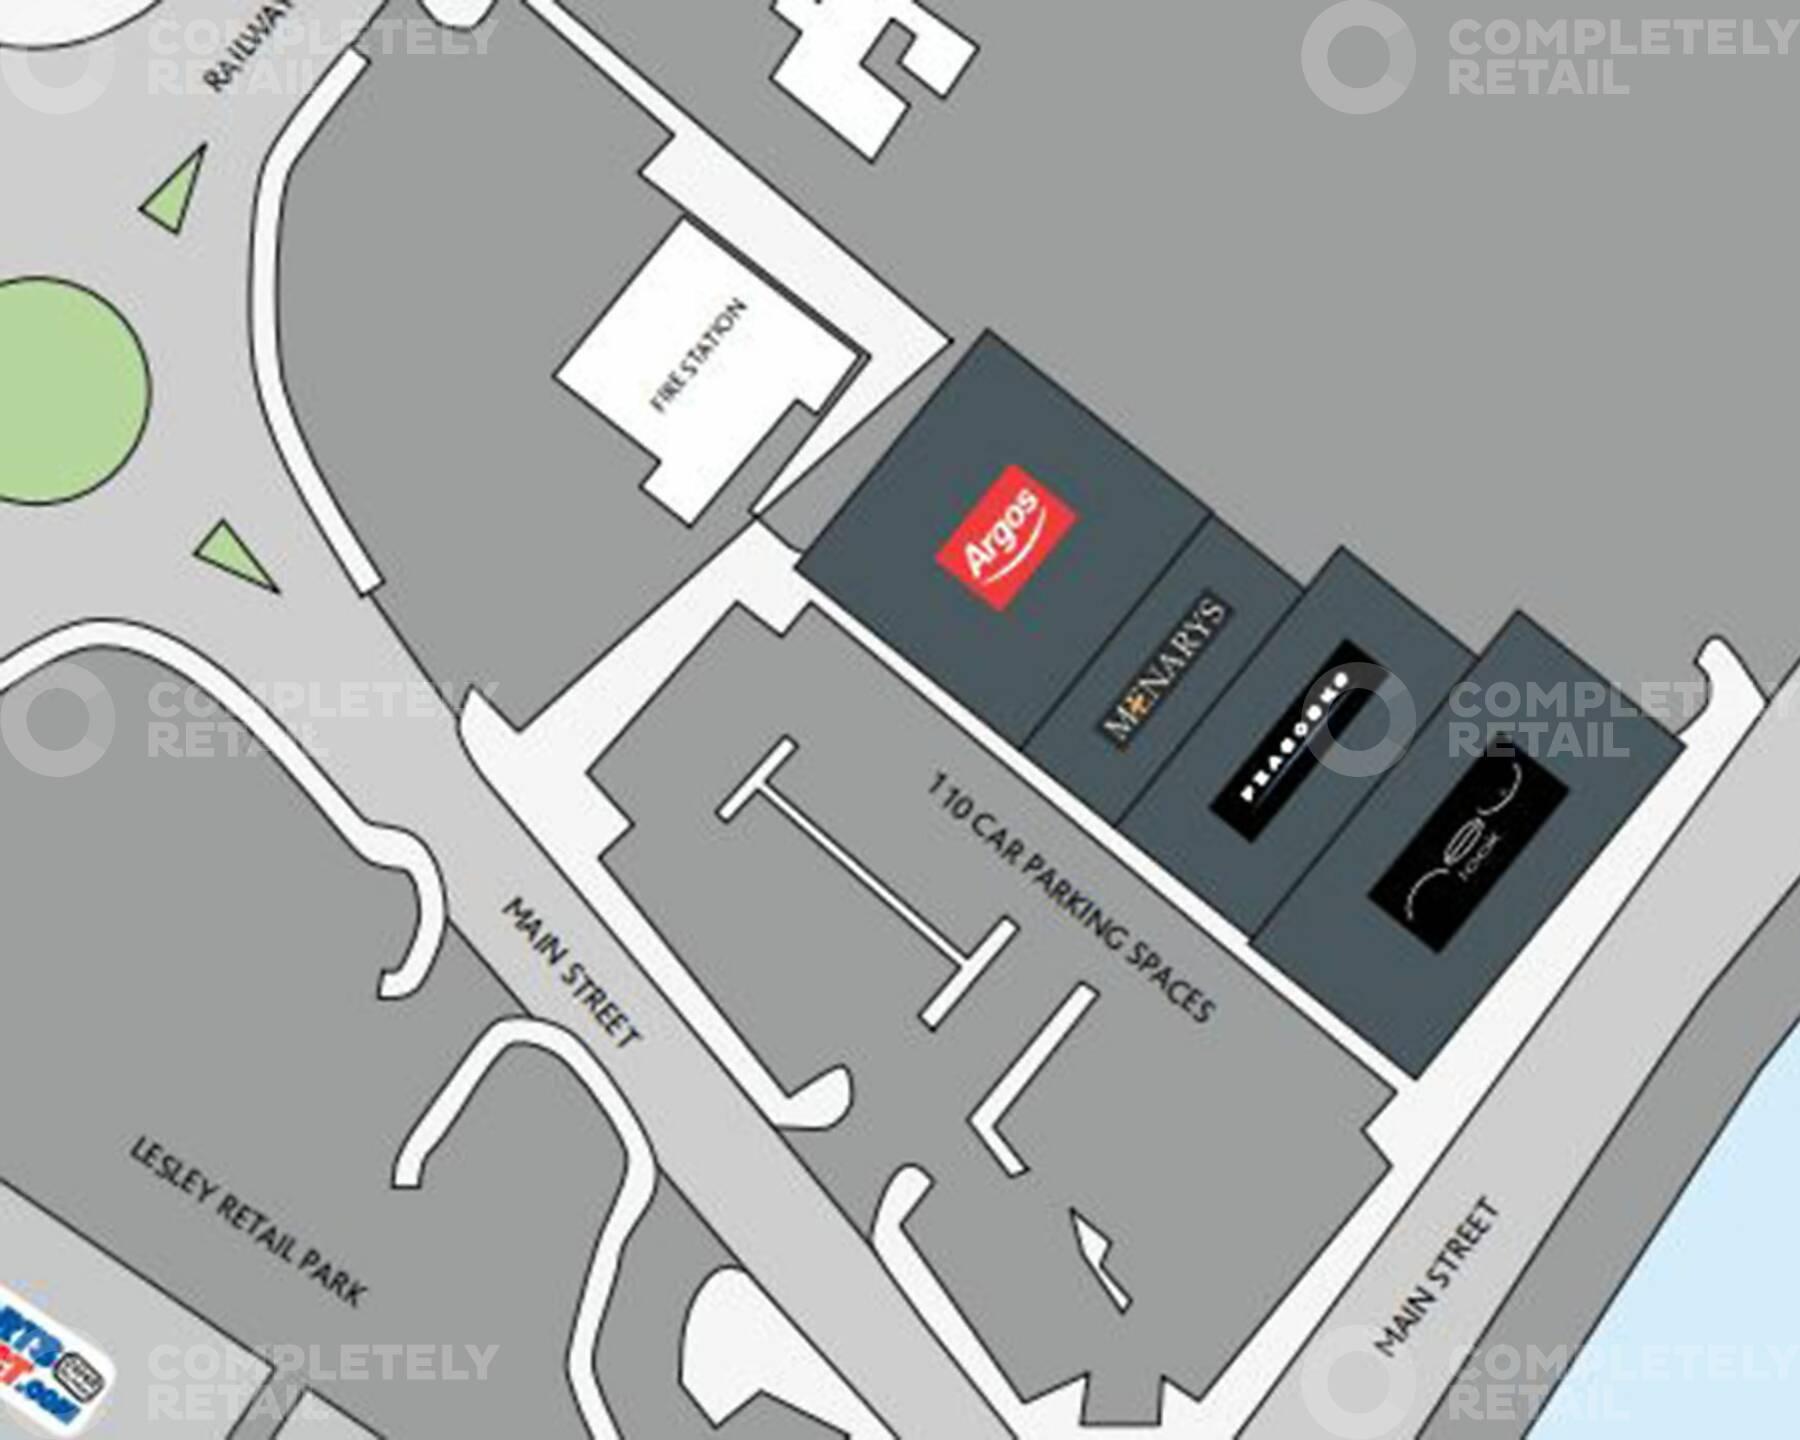 Strabane Retail Park